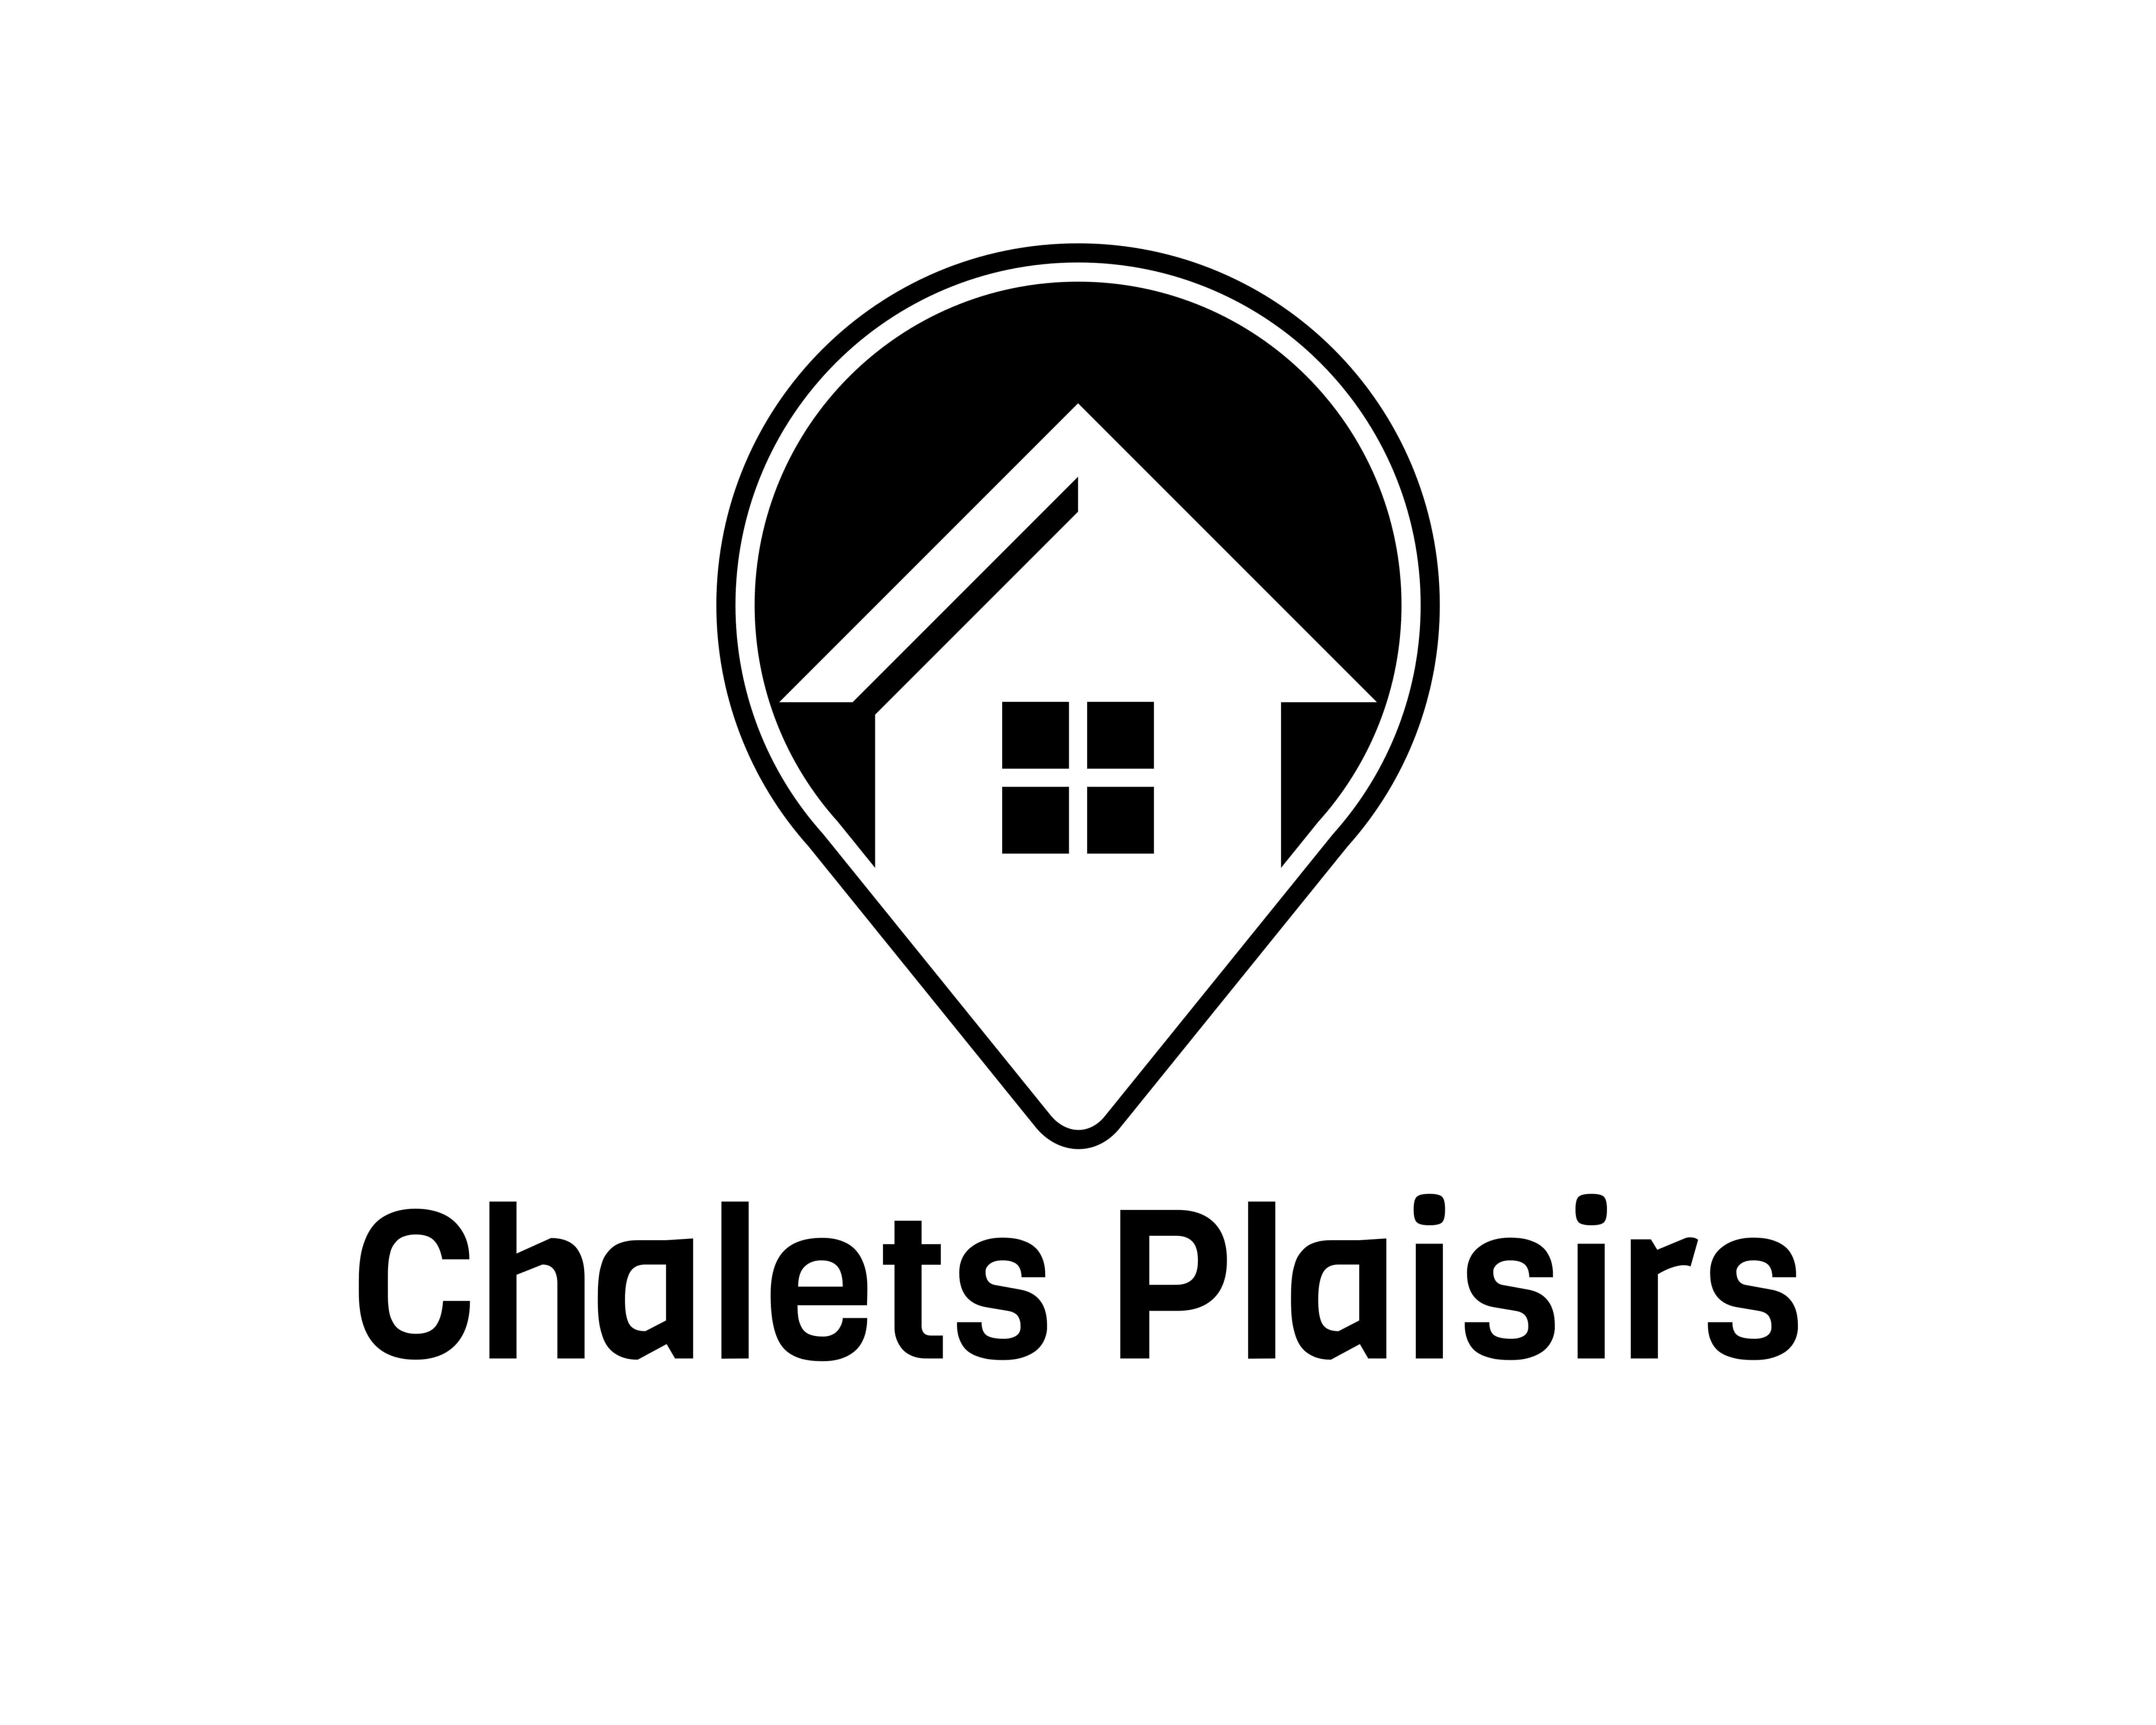 Chalets Plaisirs